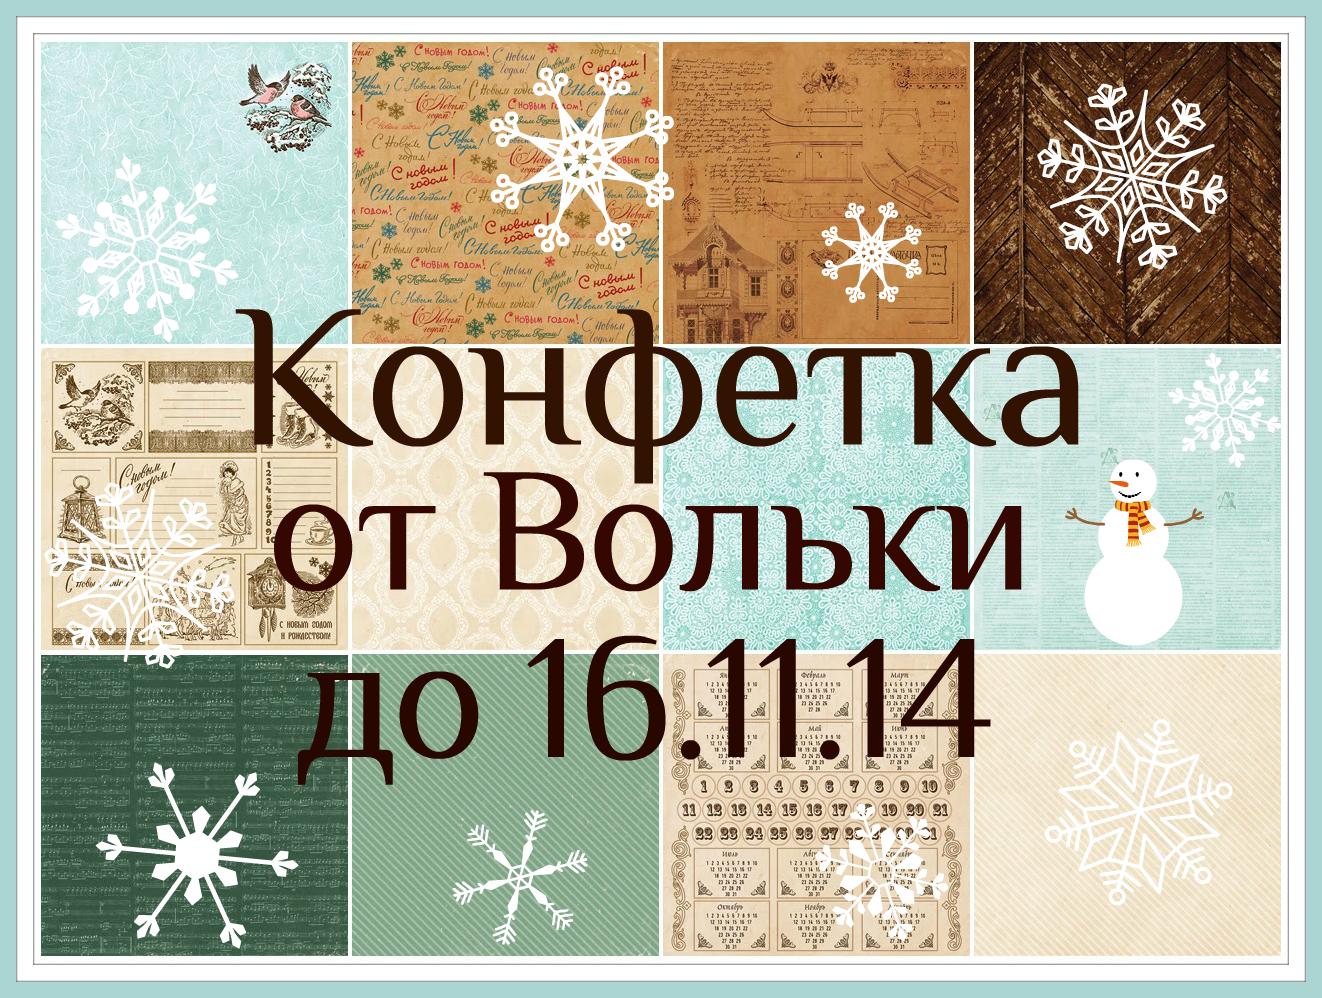 конфета от Вольки до 16 ноября